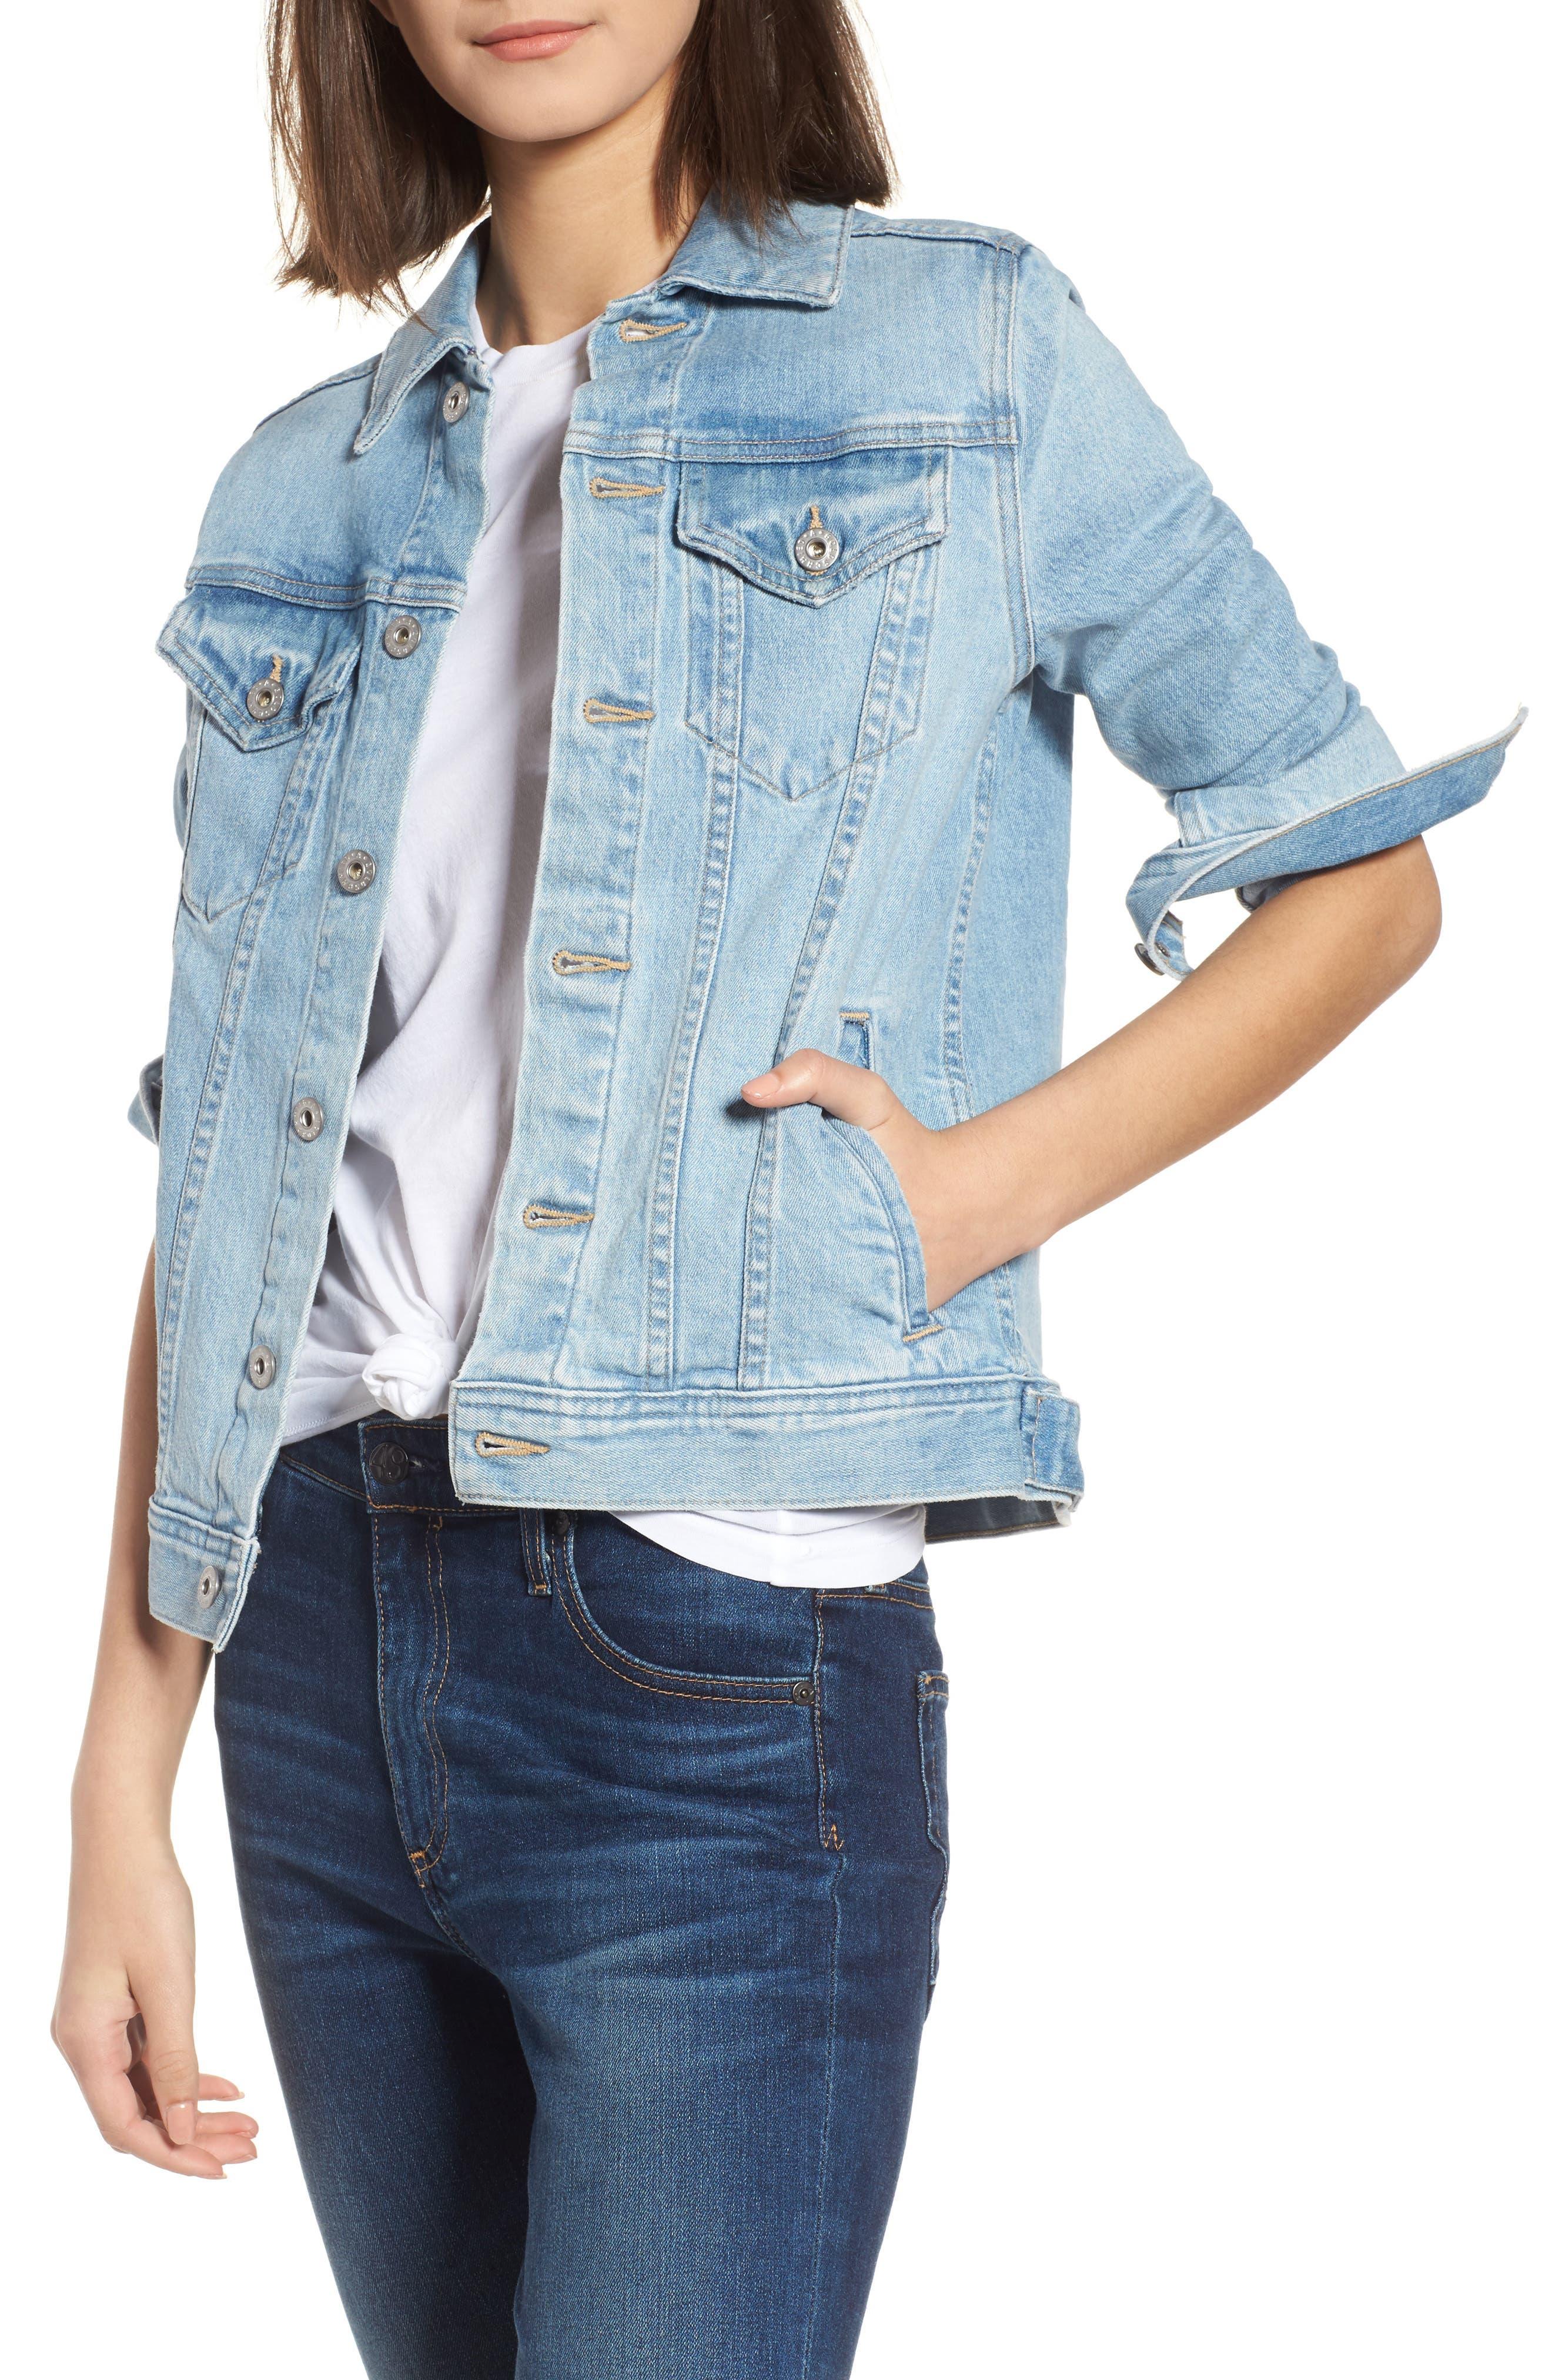 Mya Denim Jacket,                             Main thumbnail 1, color,                             SUNLIGHT BLUE